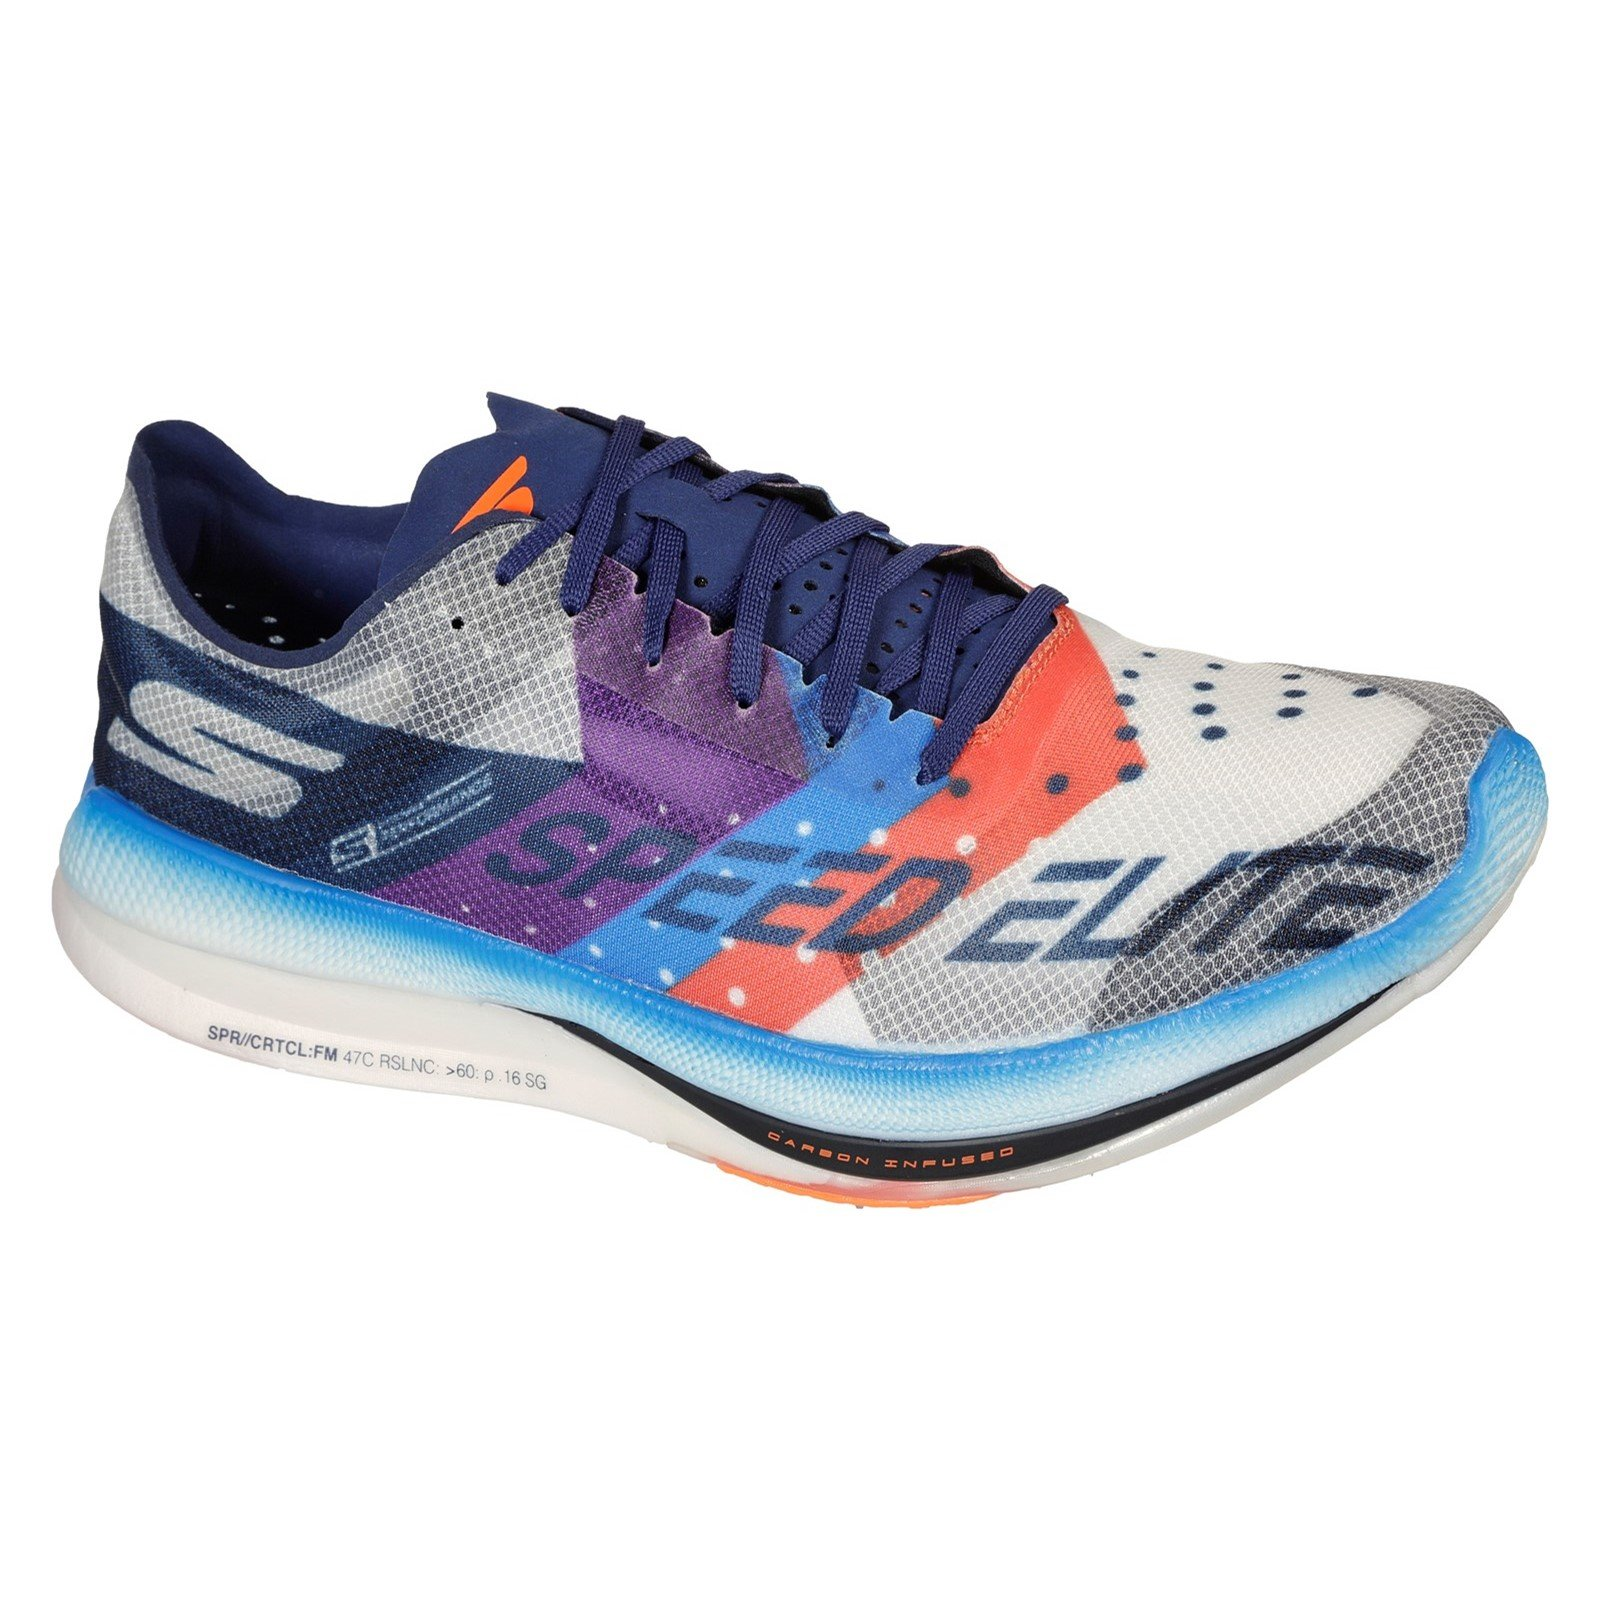 Skechers Men's Go Run Speed Elite Trainer Multicolor 32700 - White/Multi 9